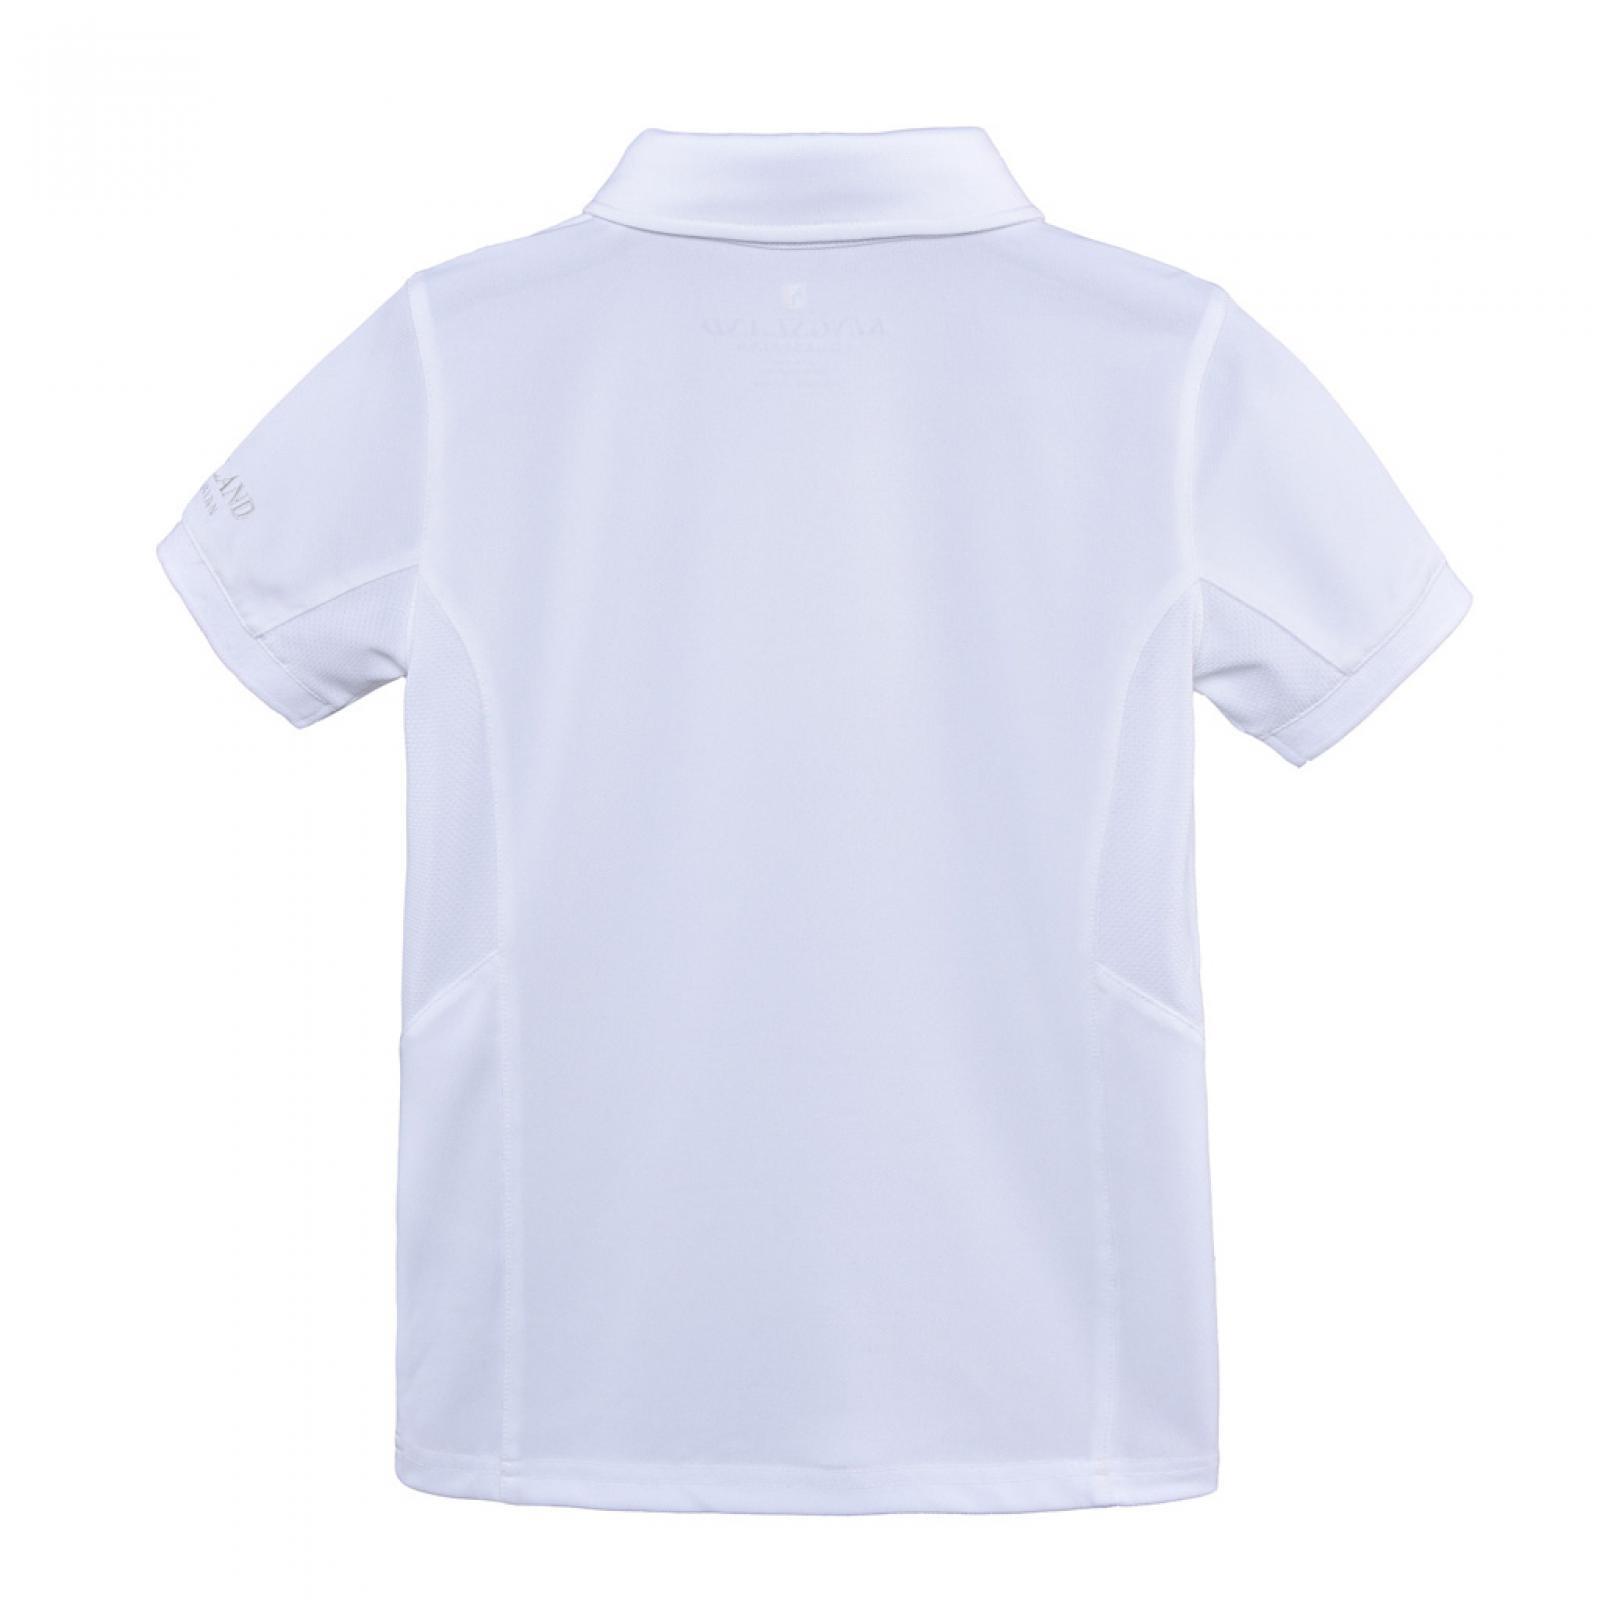 Kingsland Kingsland - Classic boys short sleeve show shirt white